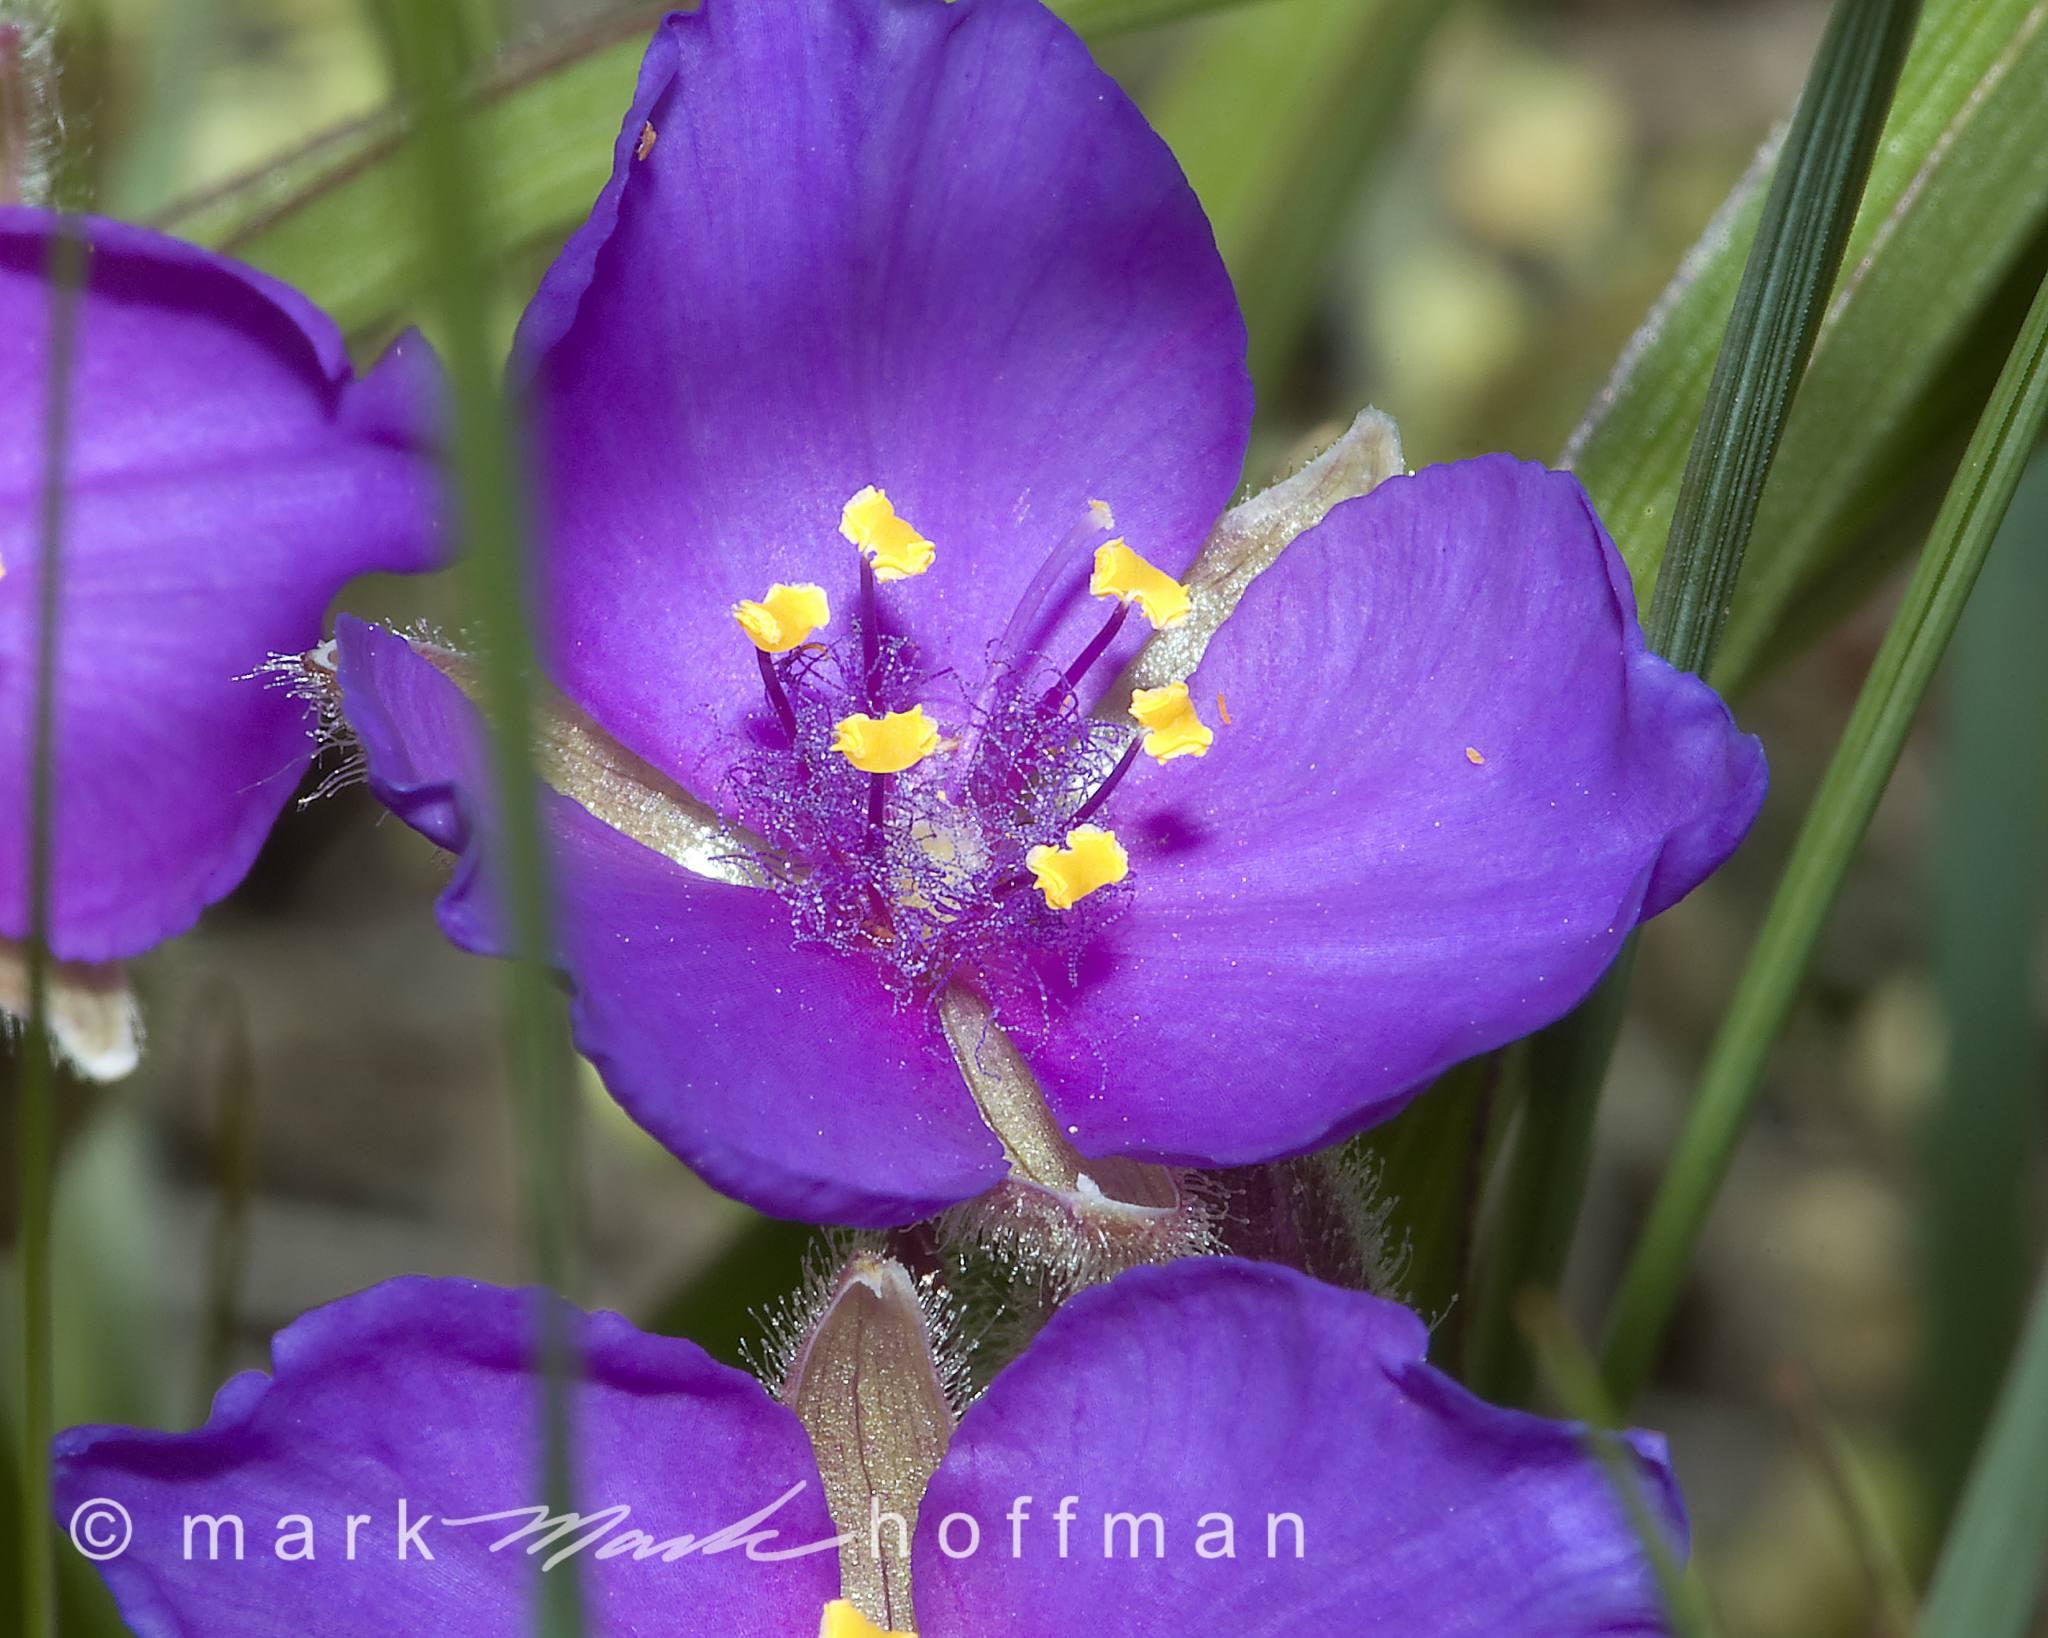 Mark_Hoffman_photophart_DSC_7279_cap1_var1.jpg